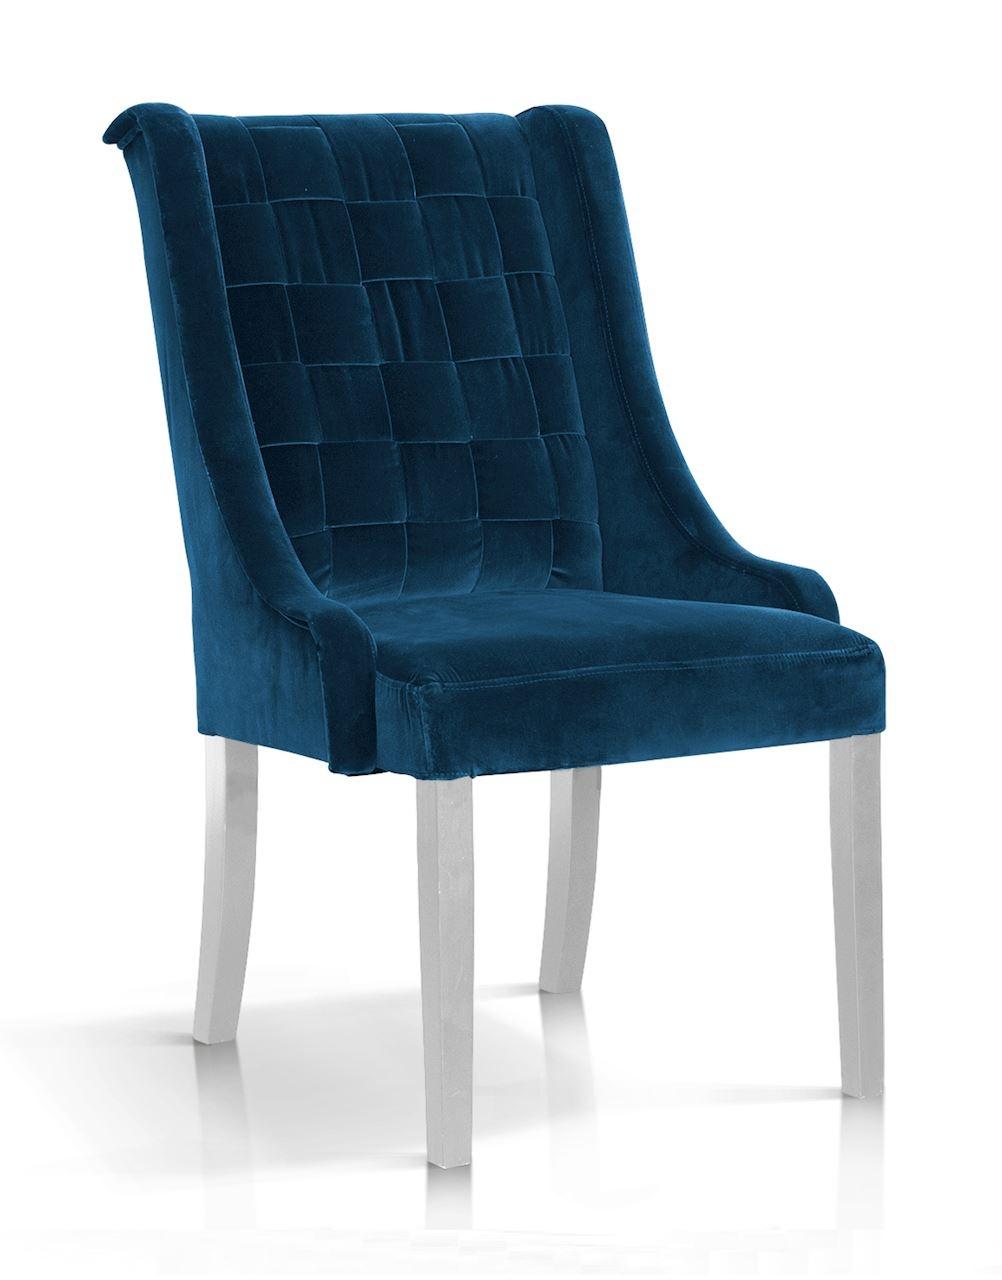 Scaun tapitat cu stofa, cu picioare din lemn Prince Velvet Bleumarin / Alb, l55xA70xH105 cm